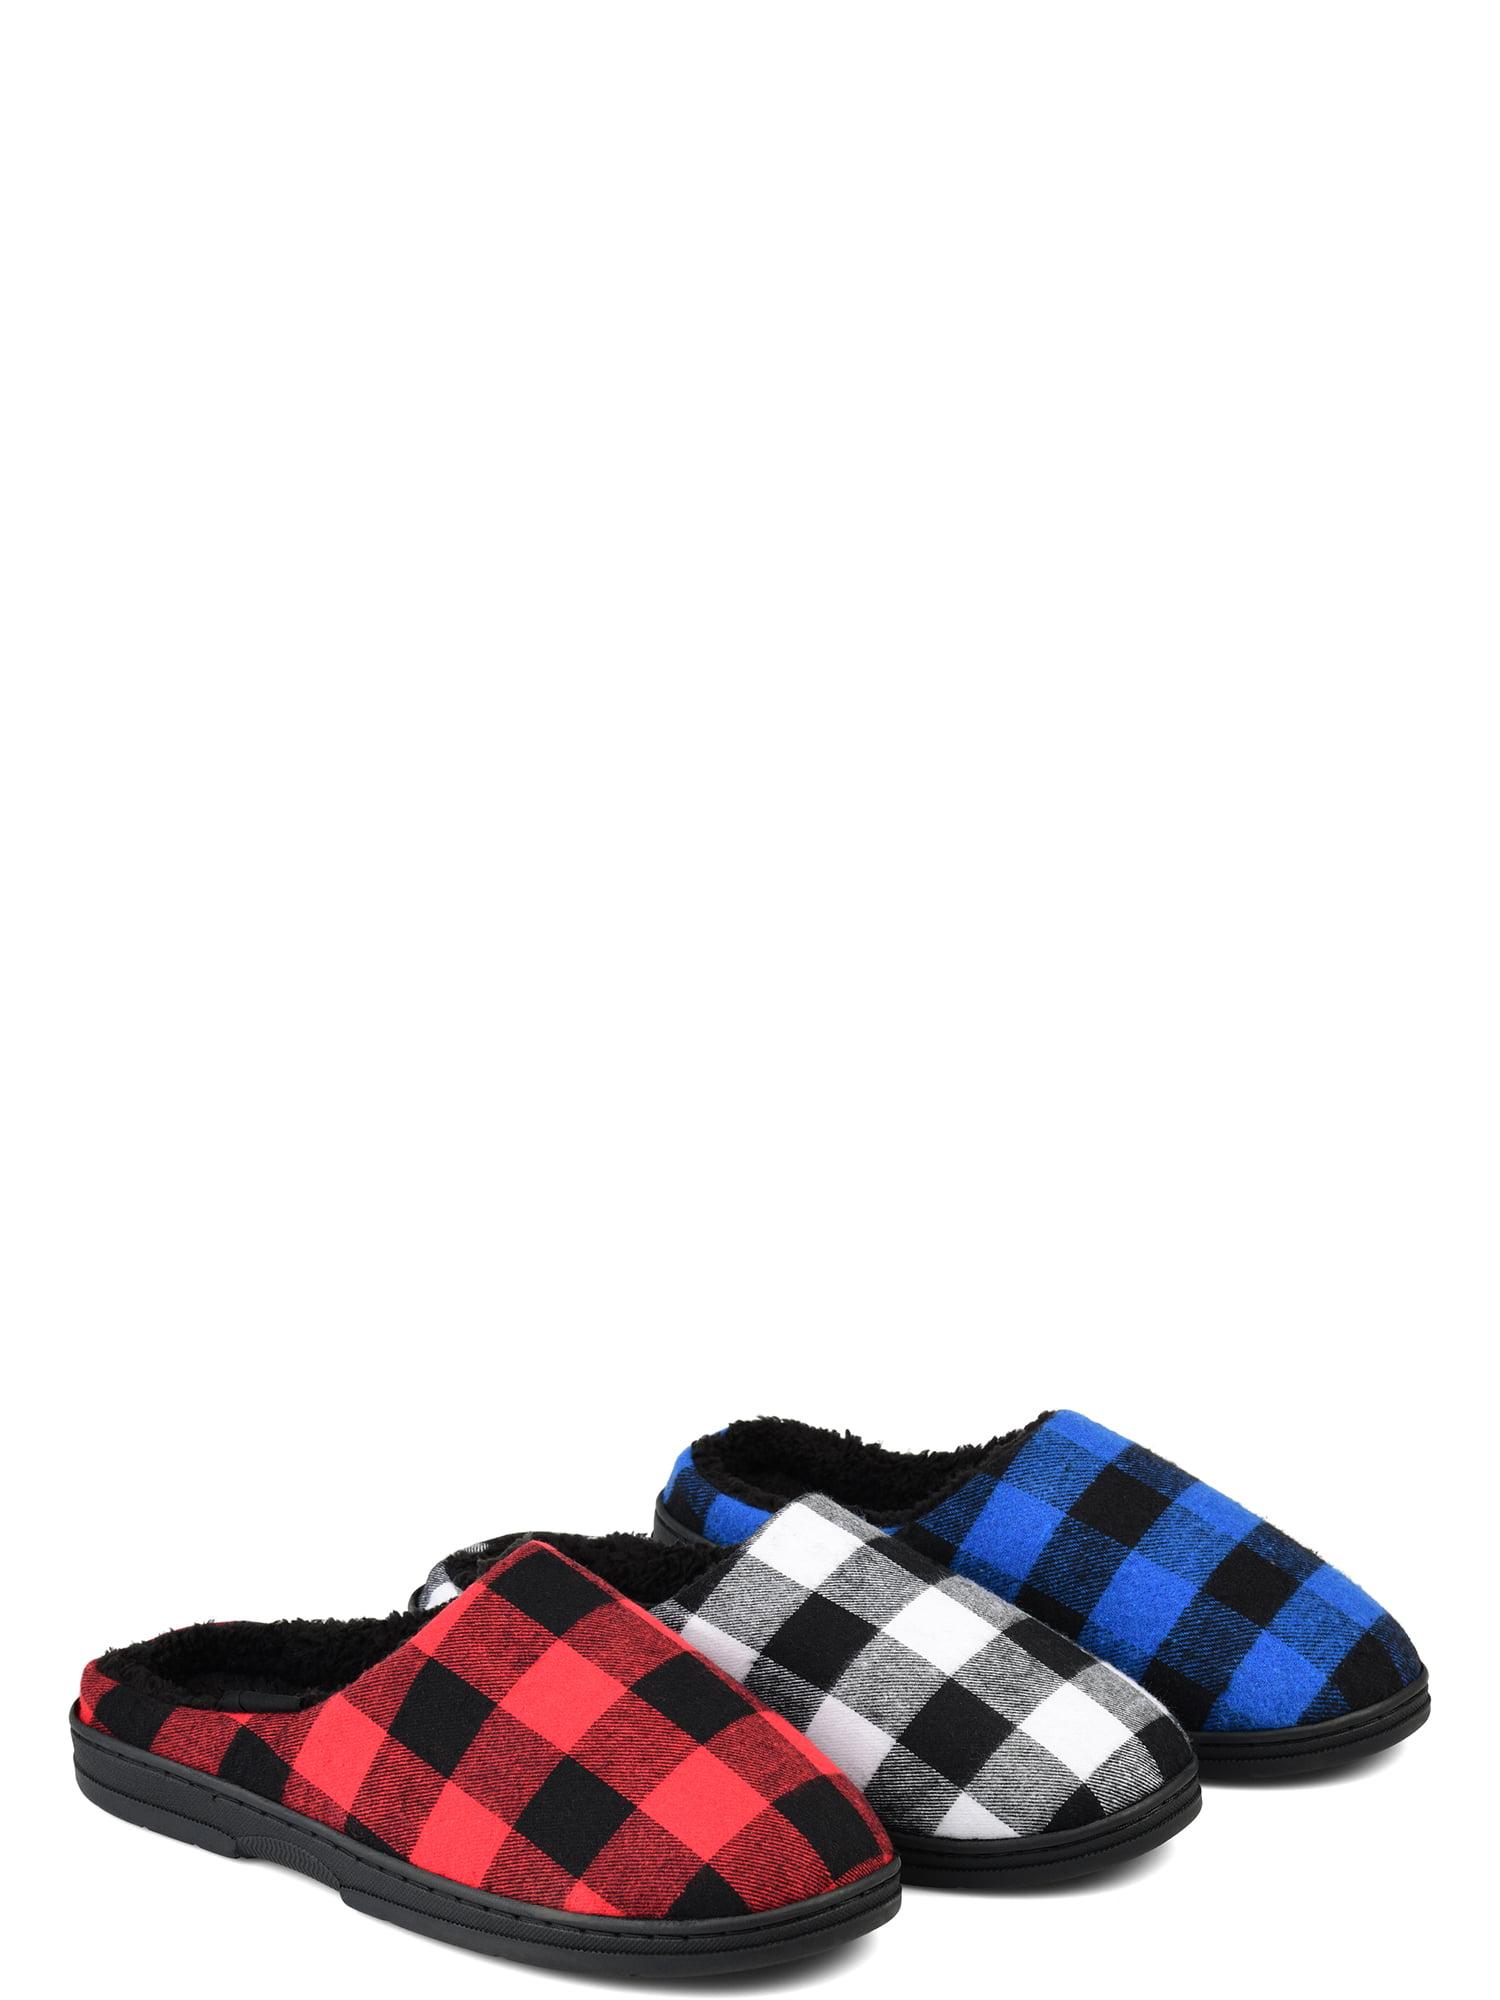 mens fur mule slippers